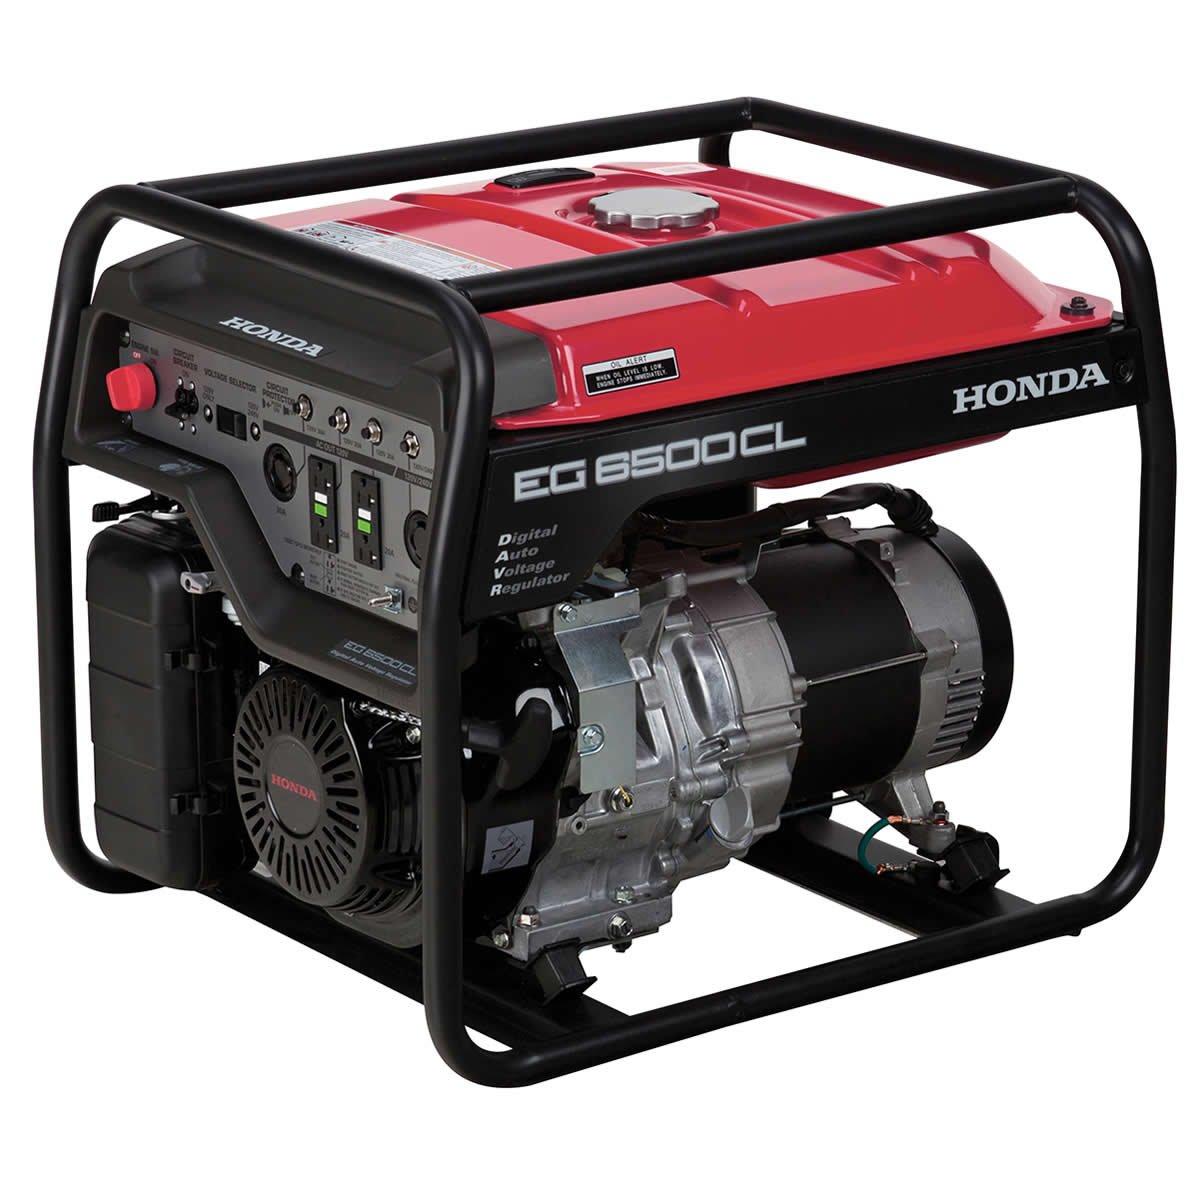 Amazon.com: Honda Power Equipment EG6500CLAT 655690 6,500W Portable  Generator with DAVR Technology CARB, Steel: Industrial & Scientific